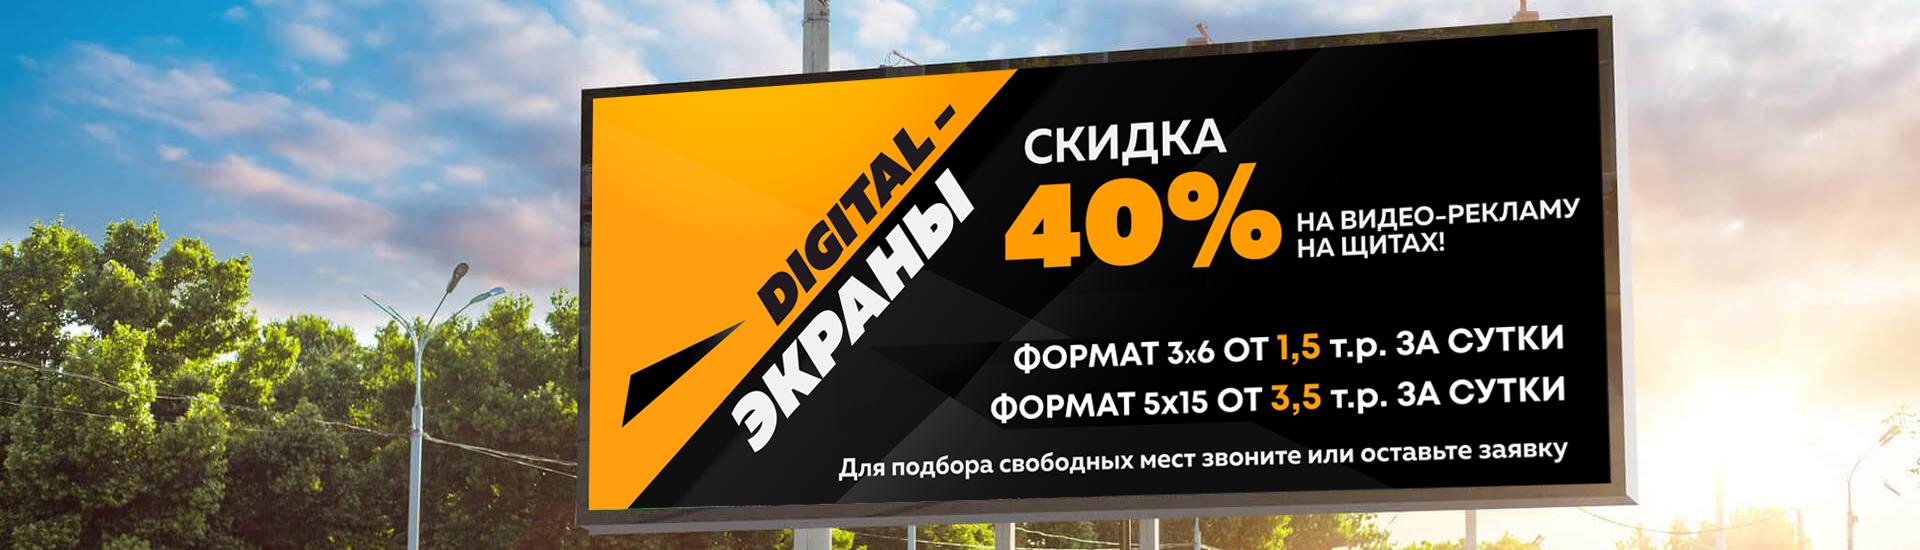 реклама в интернете санкт петербурге